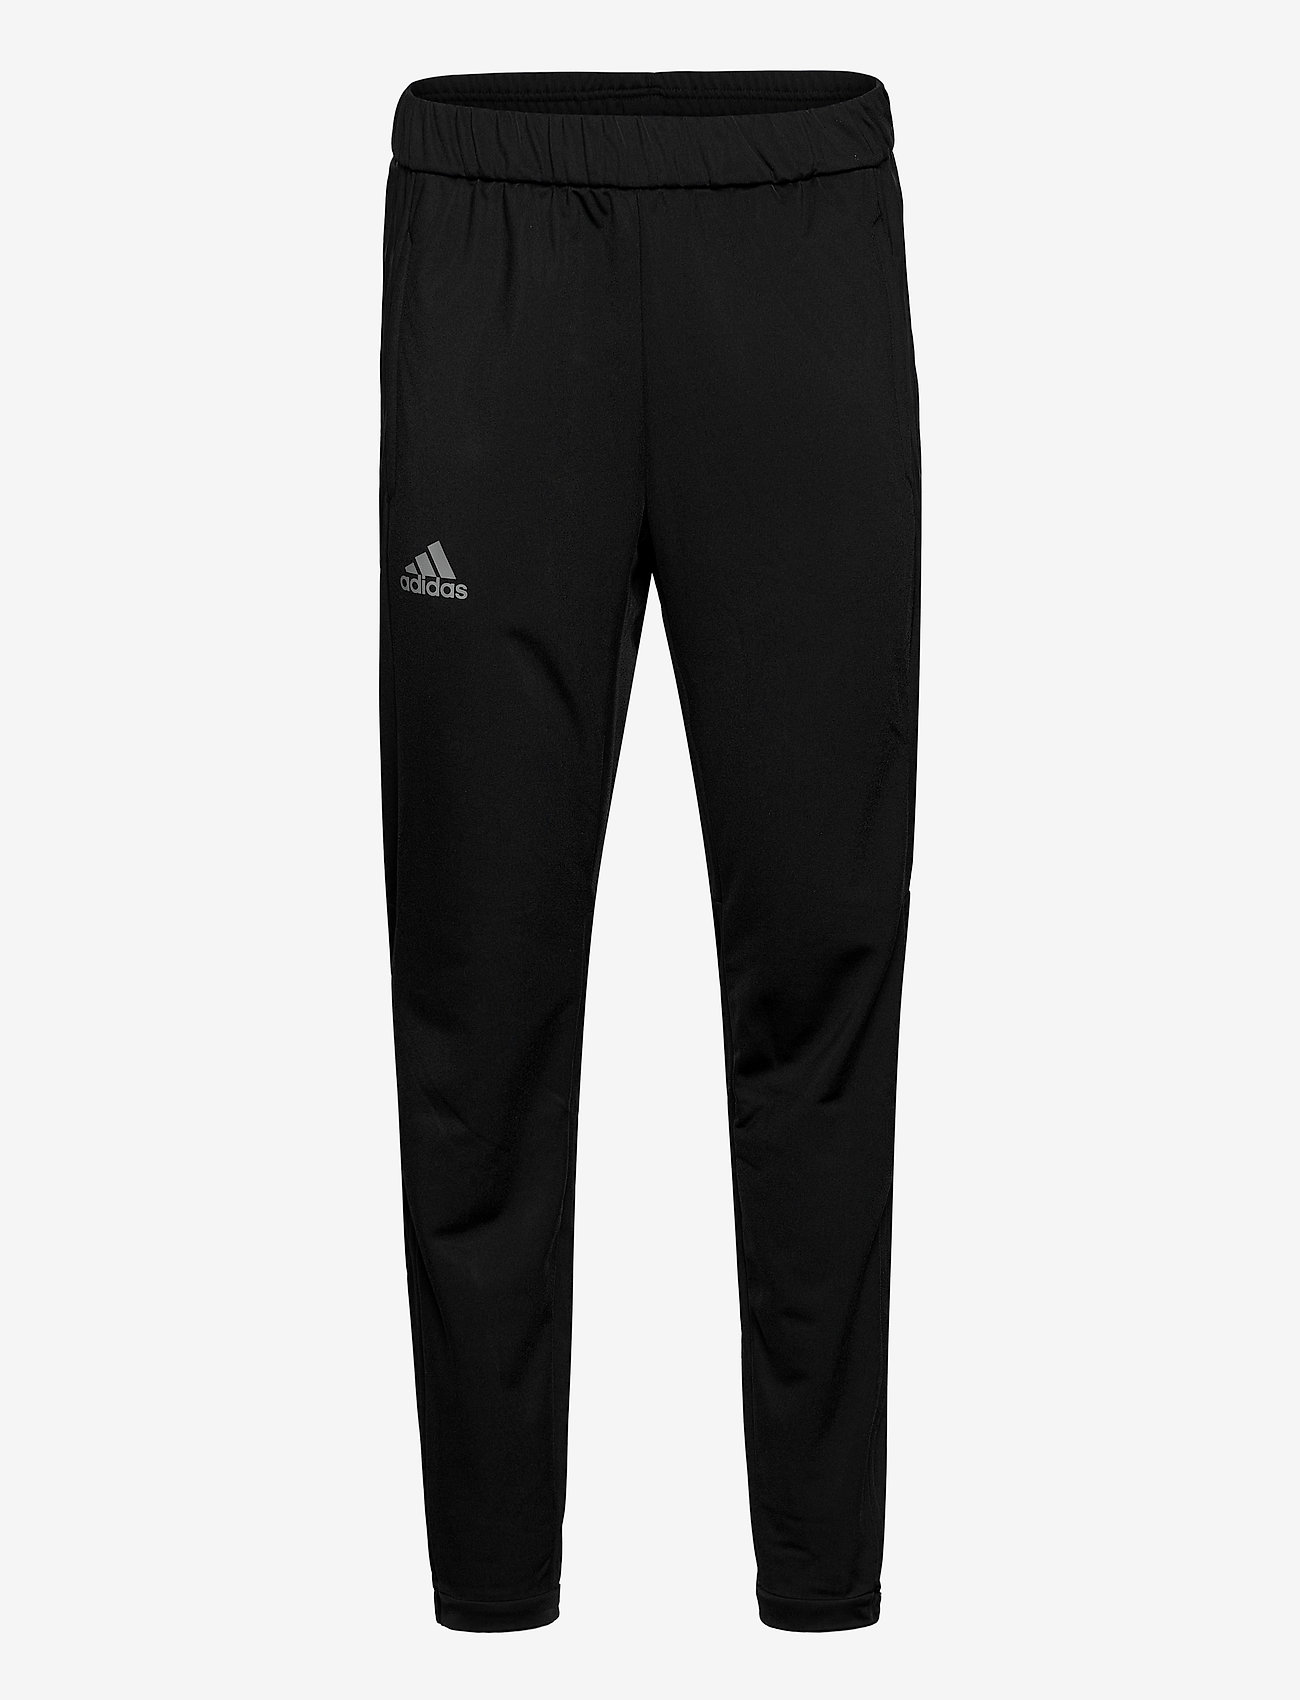 adidas Performance - 3 STRIPES KNIT PANTS - treenihousut - 000/black - 0